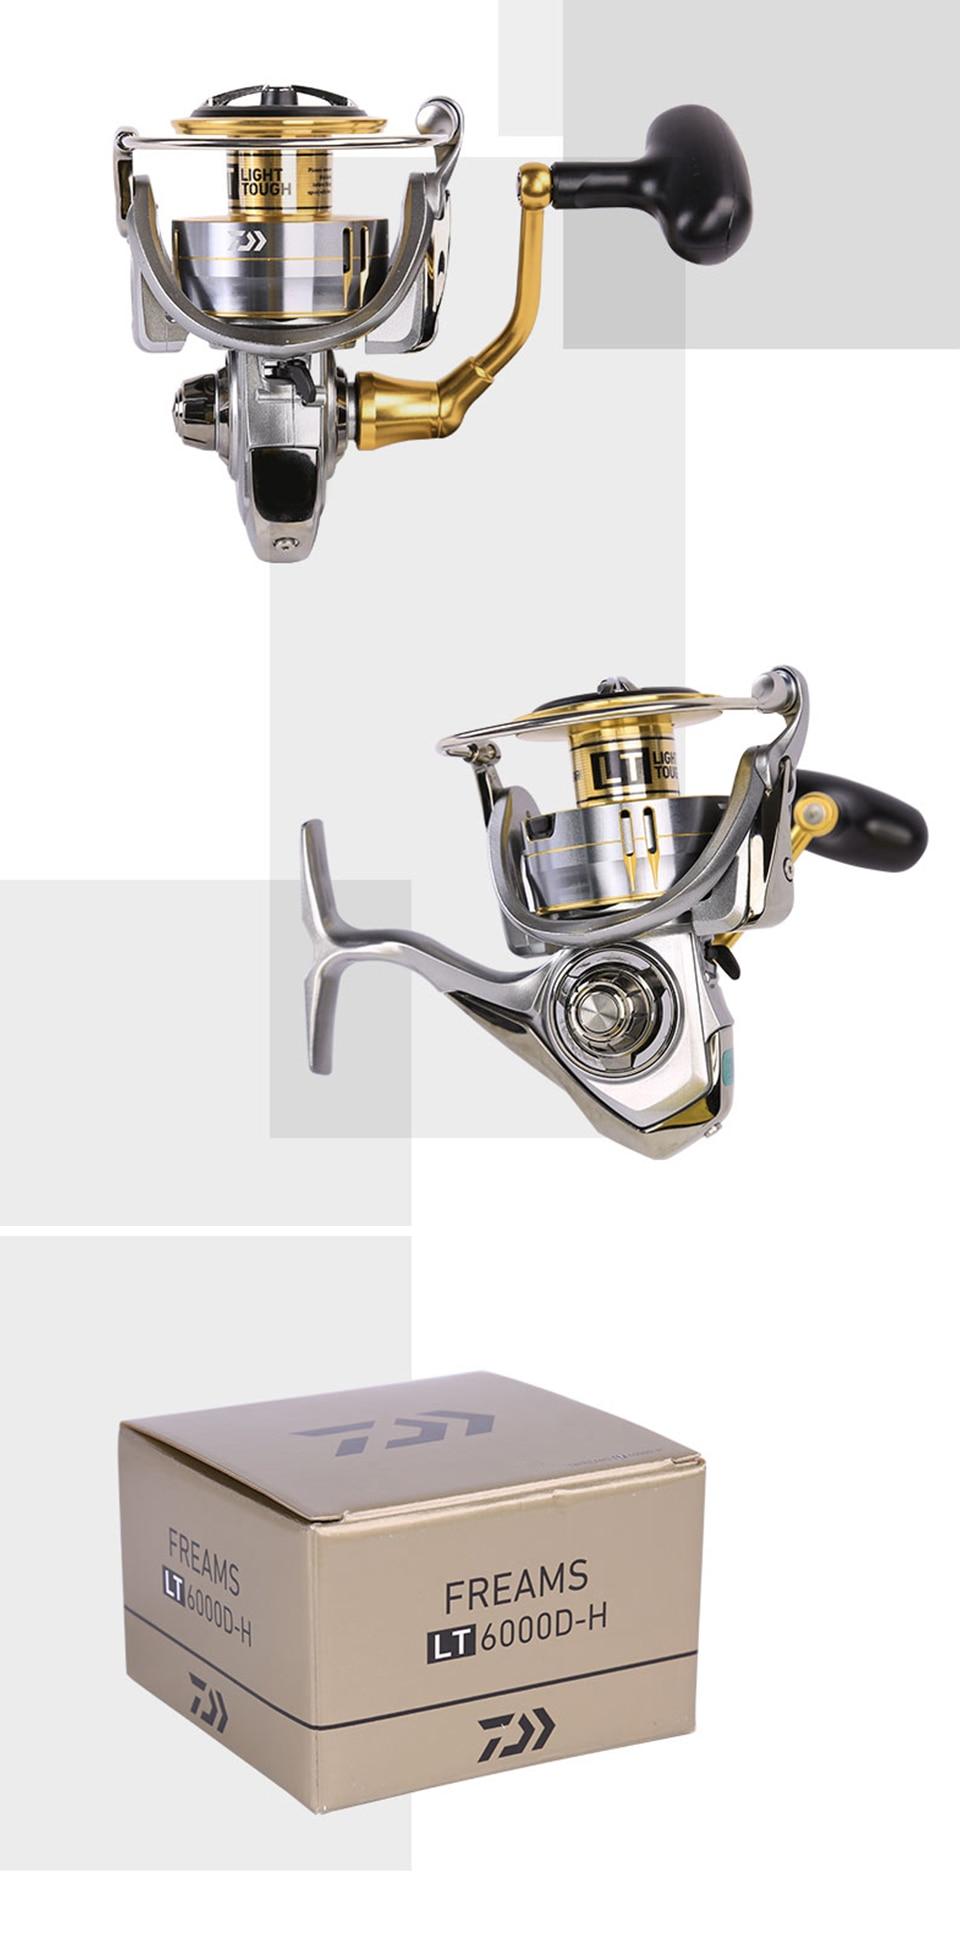 LT 2000s 3000 3000D-C 5000D-CXH Spinning reel